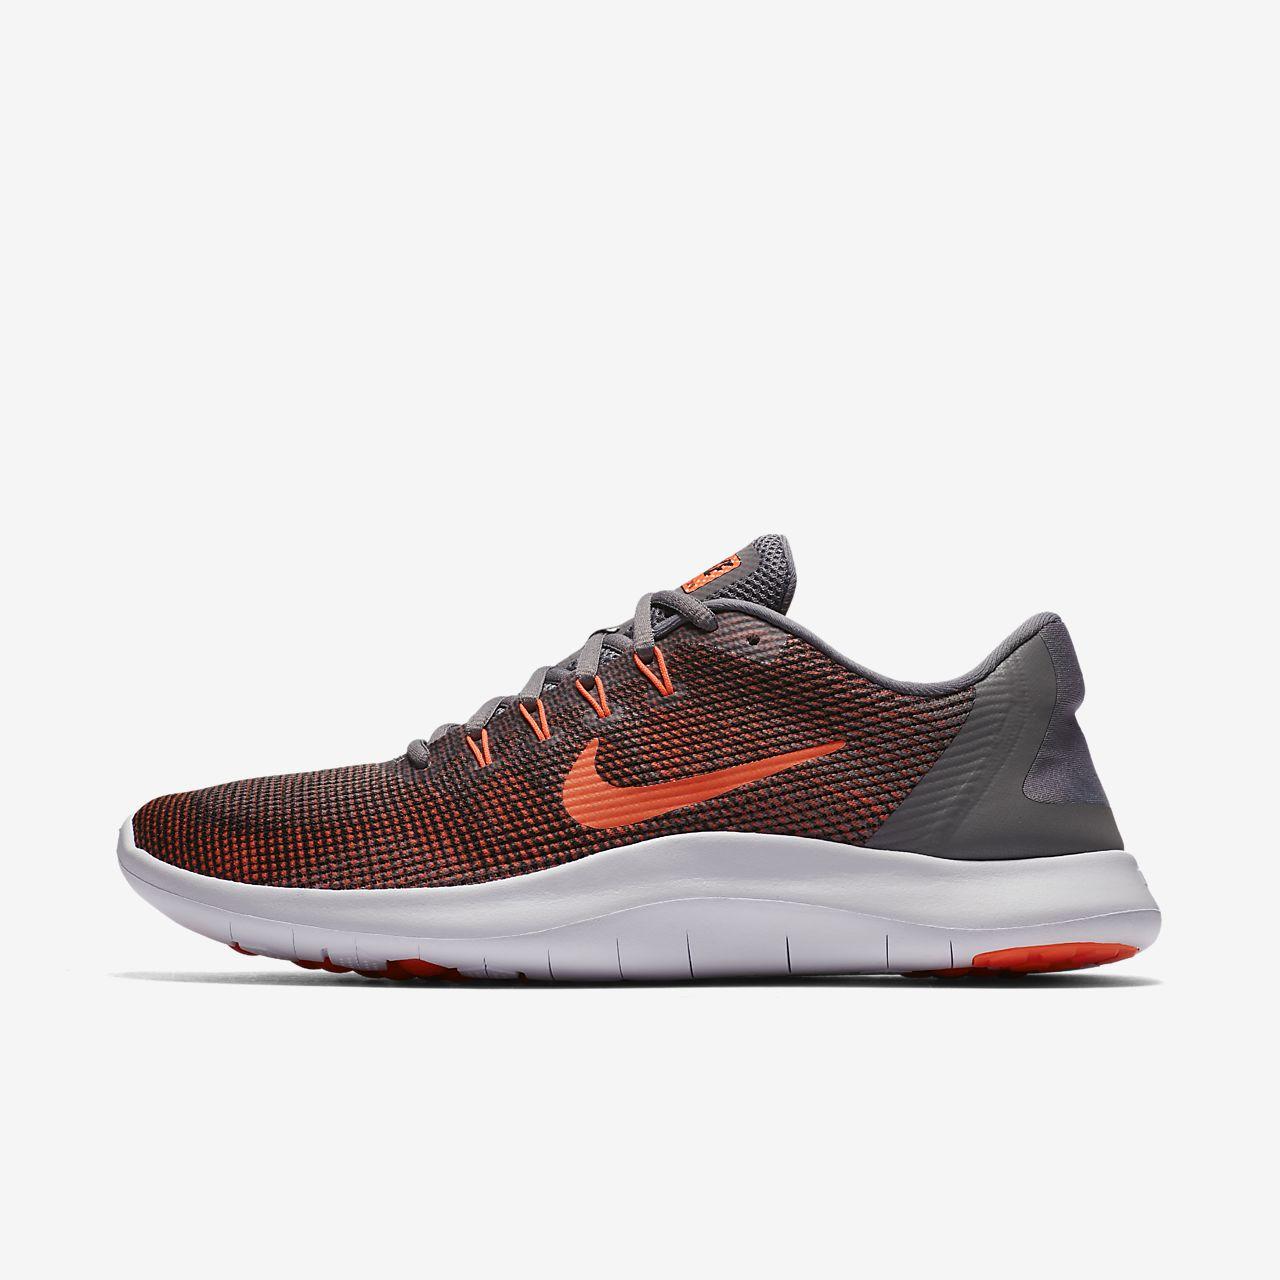 ... Chaussure de running Nike Flex 2018 RN pour Homme